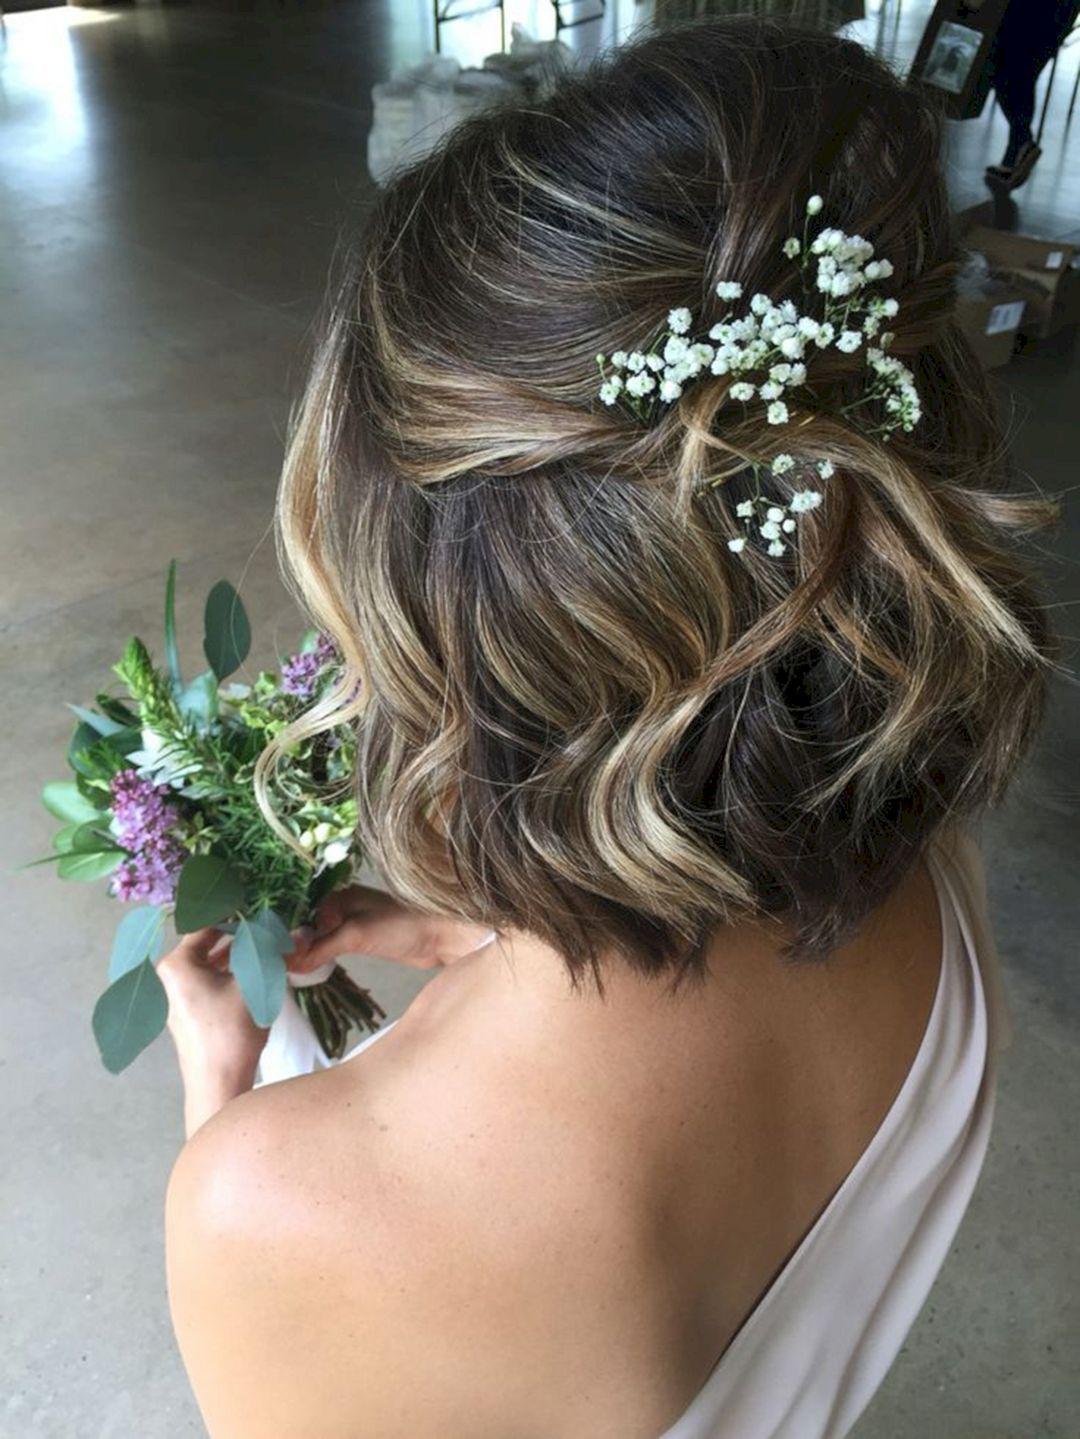 hannahs hair wedding hairstyles for short hair short hair wedding styles short hairdos for